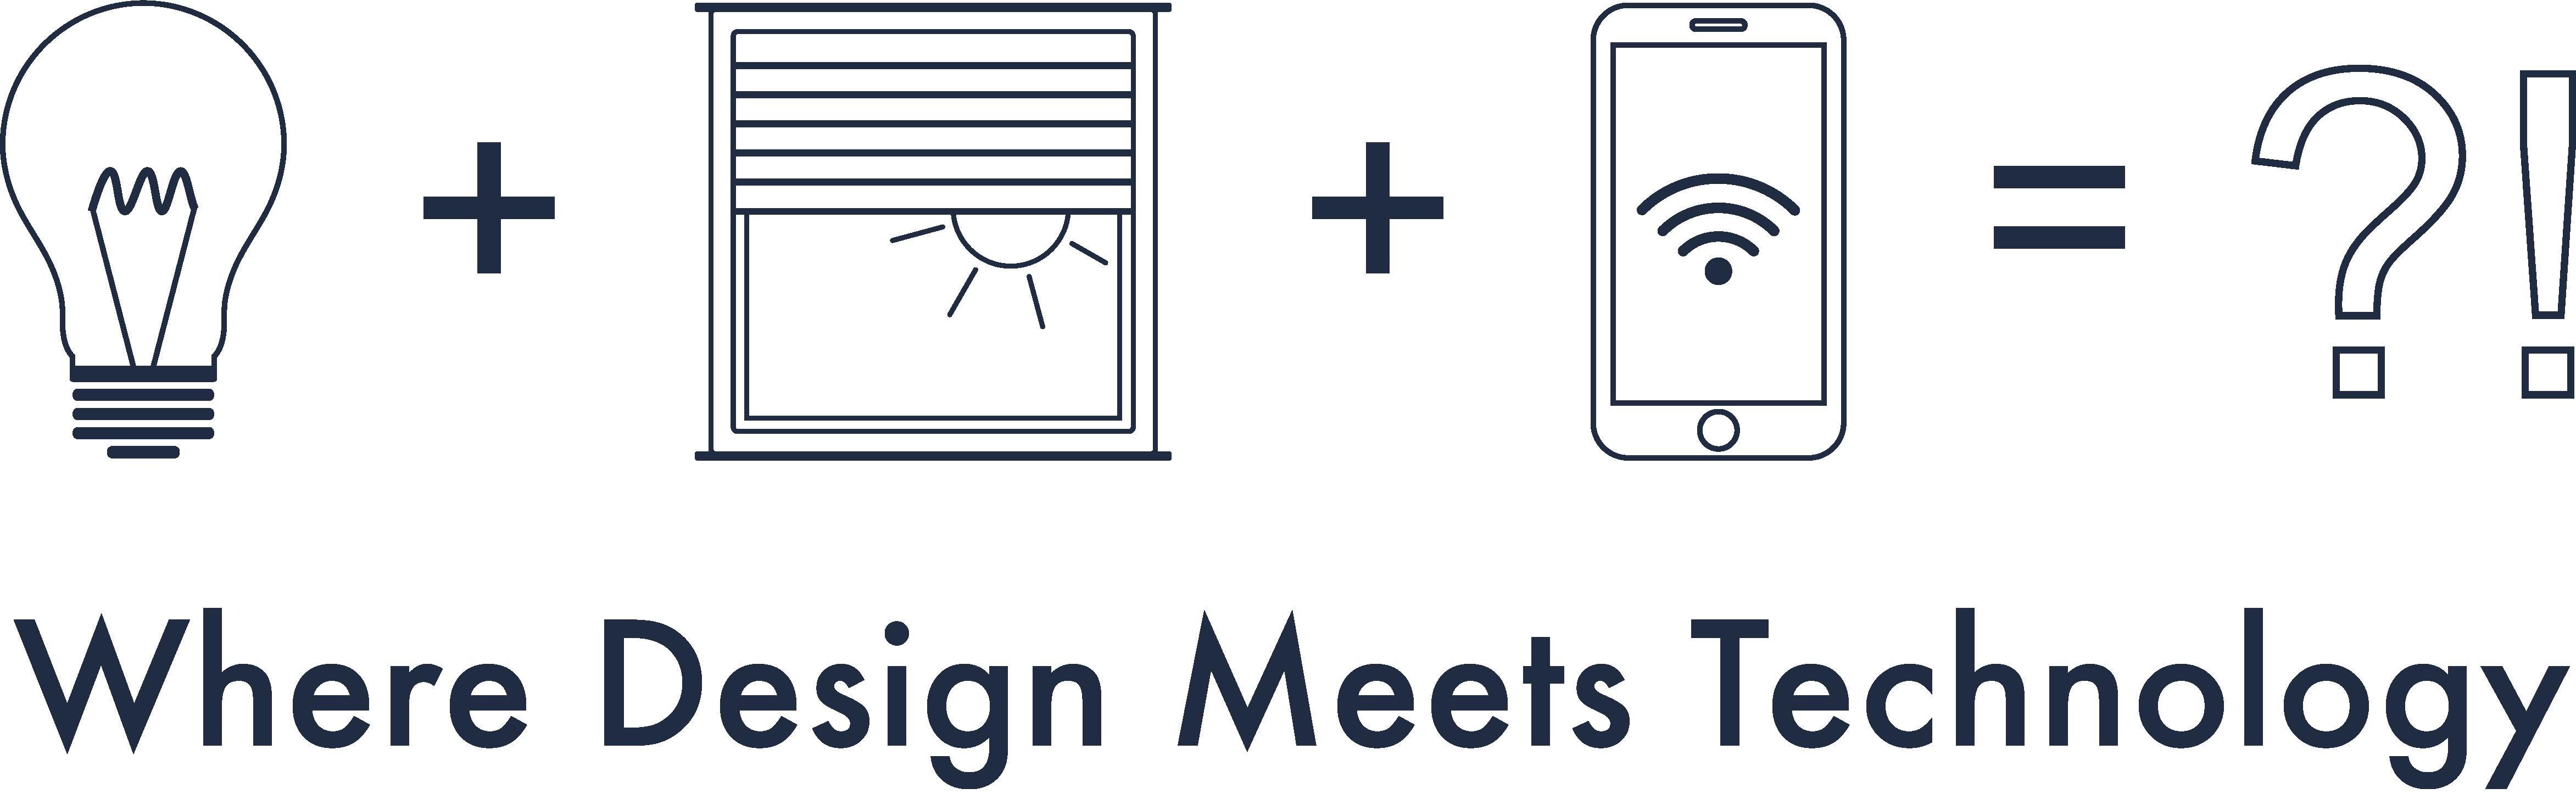 Where Design Meets Technology